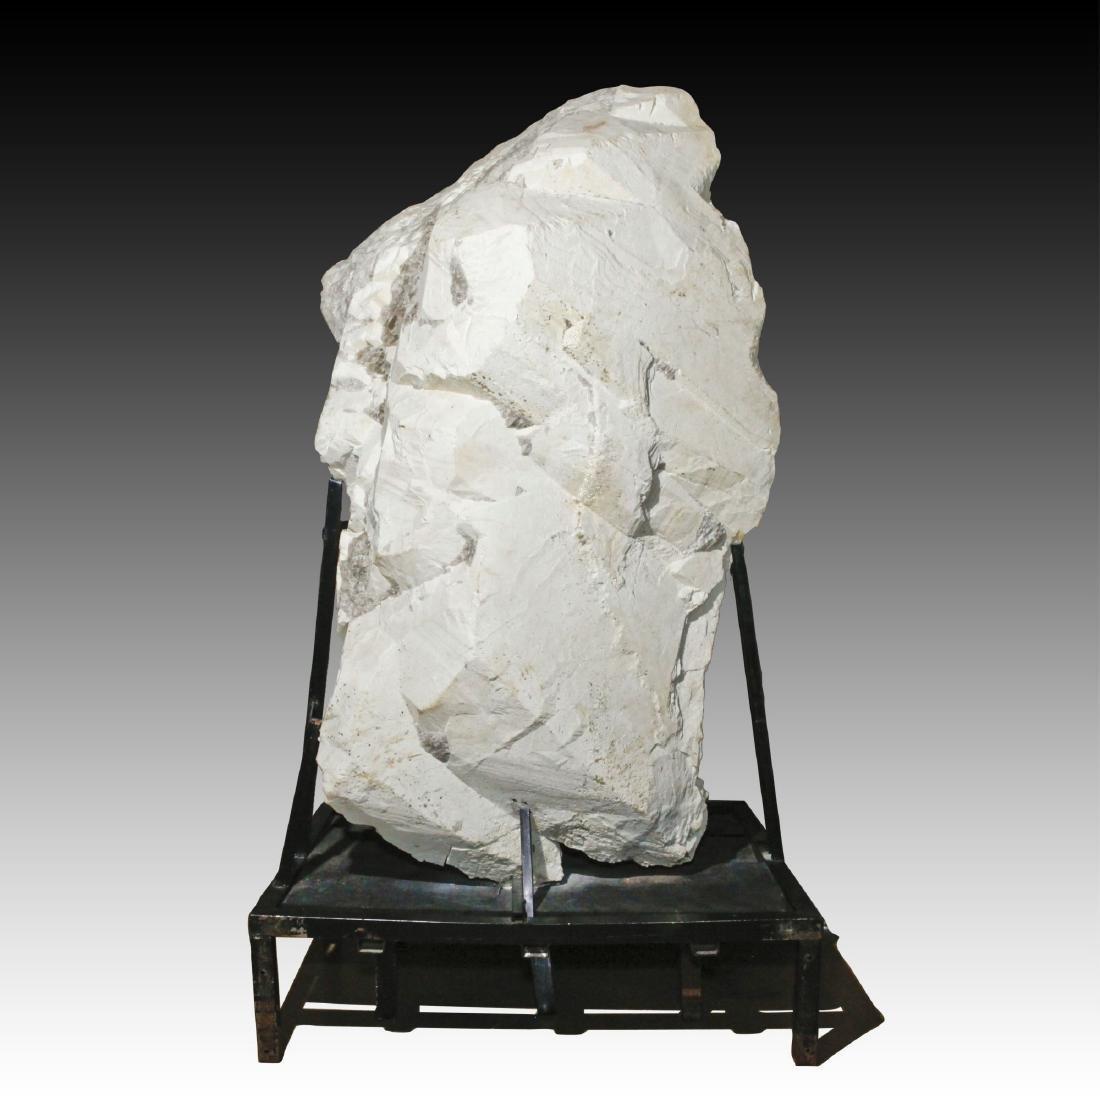 Large Alkali Feldspar Granite Stone Brazil